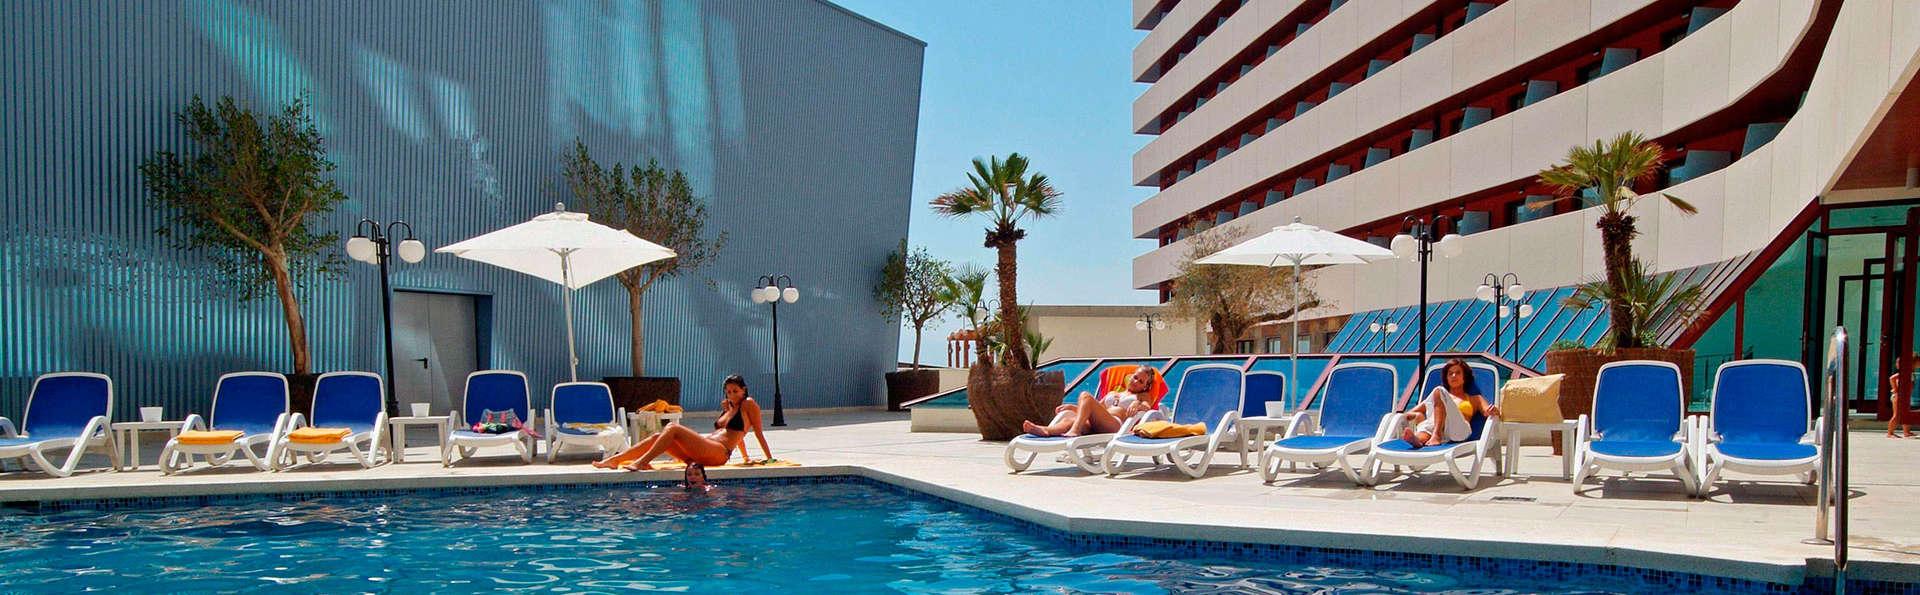 Ohtels Campo de Gibraltar - EDIT_pool.jpg